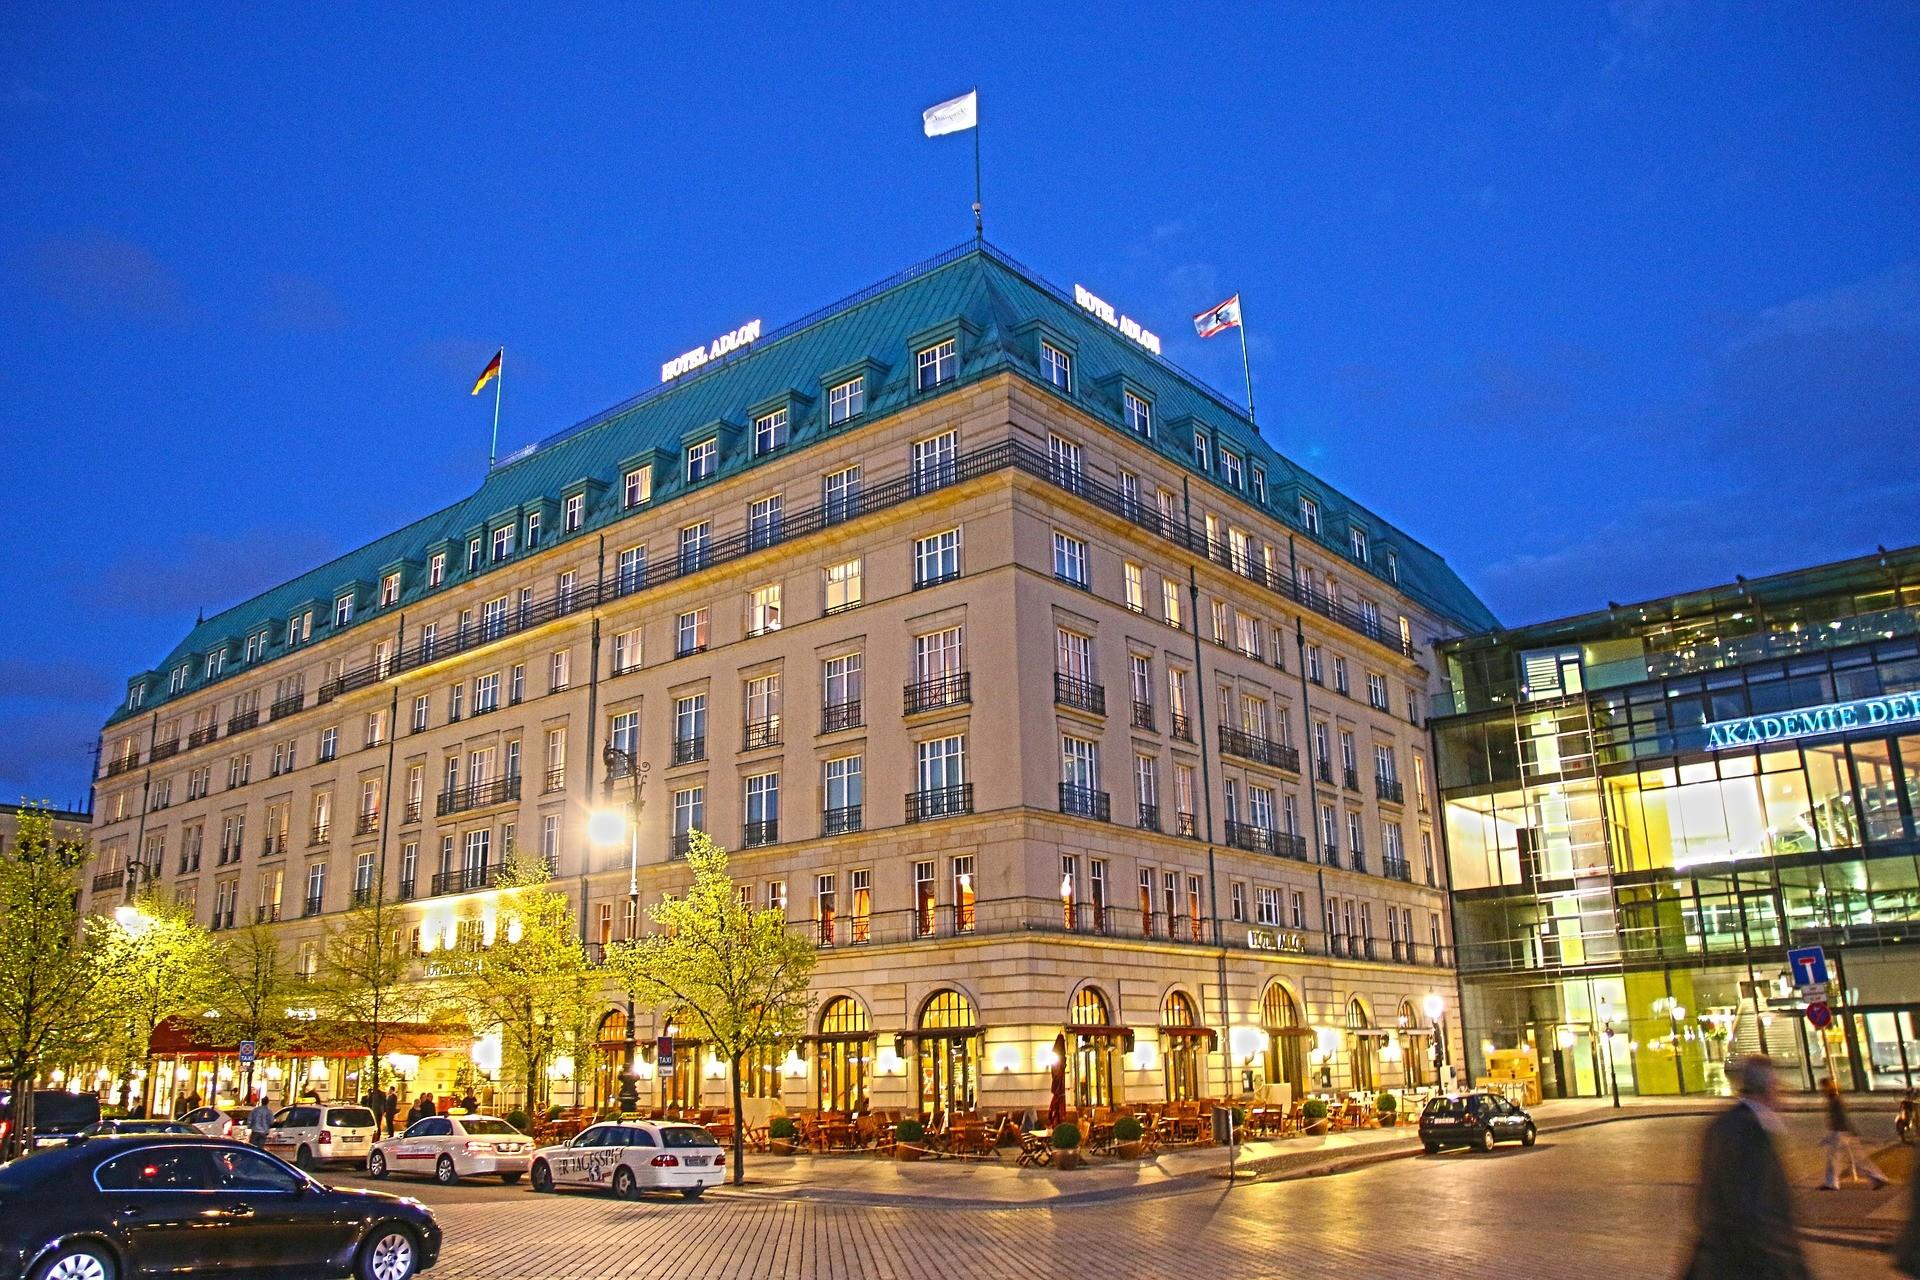 Berlino dove dormire: Hotel Adlon Berlino - Foto di Moerschy